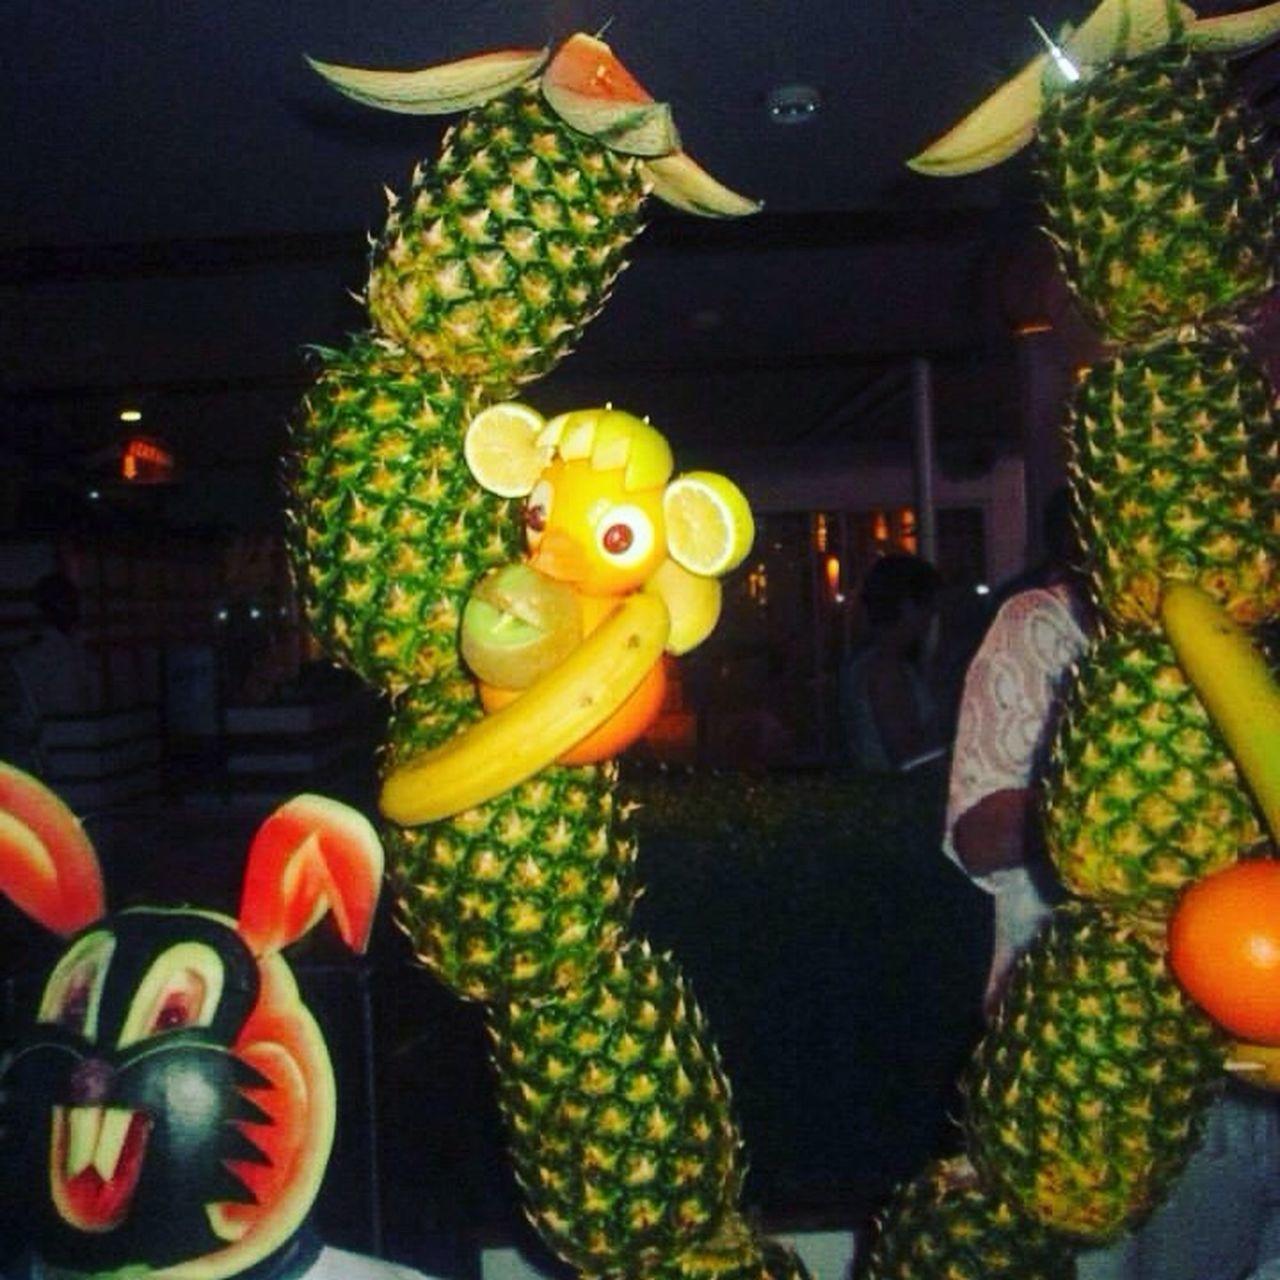 animal representation, celebration, food and drink, fruit, food, night, no people, illuminated, freshness, indoors, dragon, chinese dragon, close-up